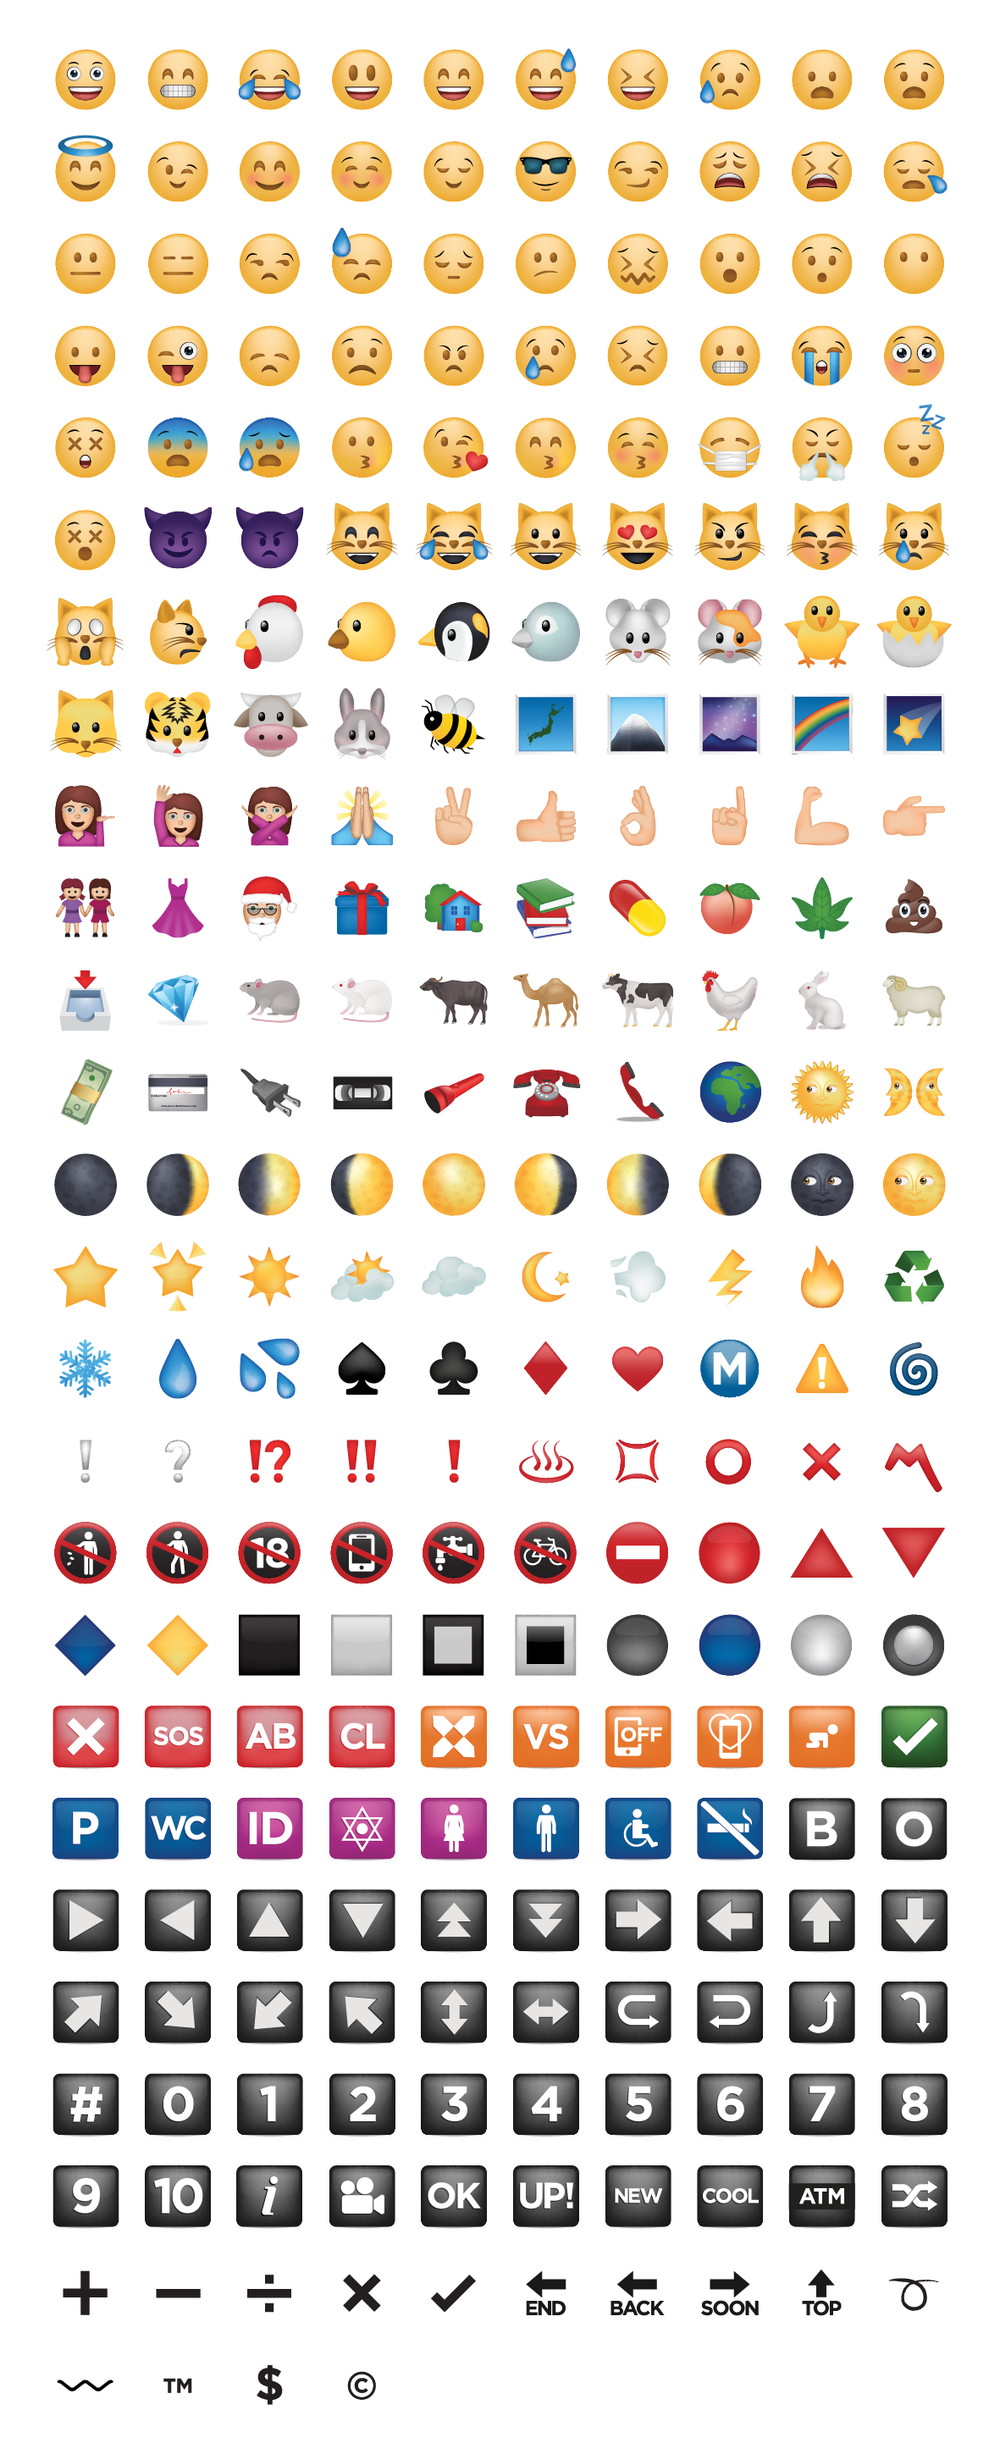 250+ custom emojis resembling iOS versions